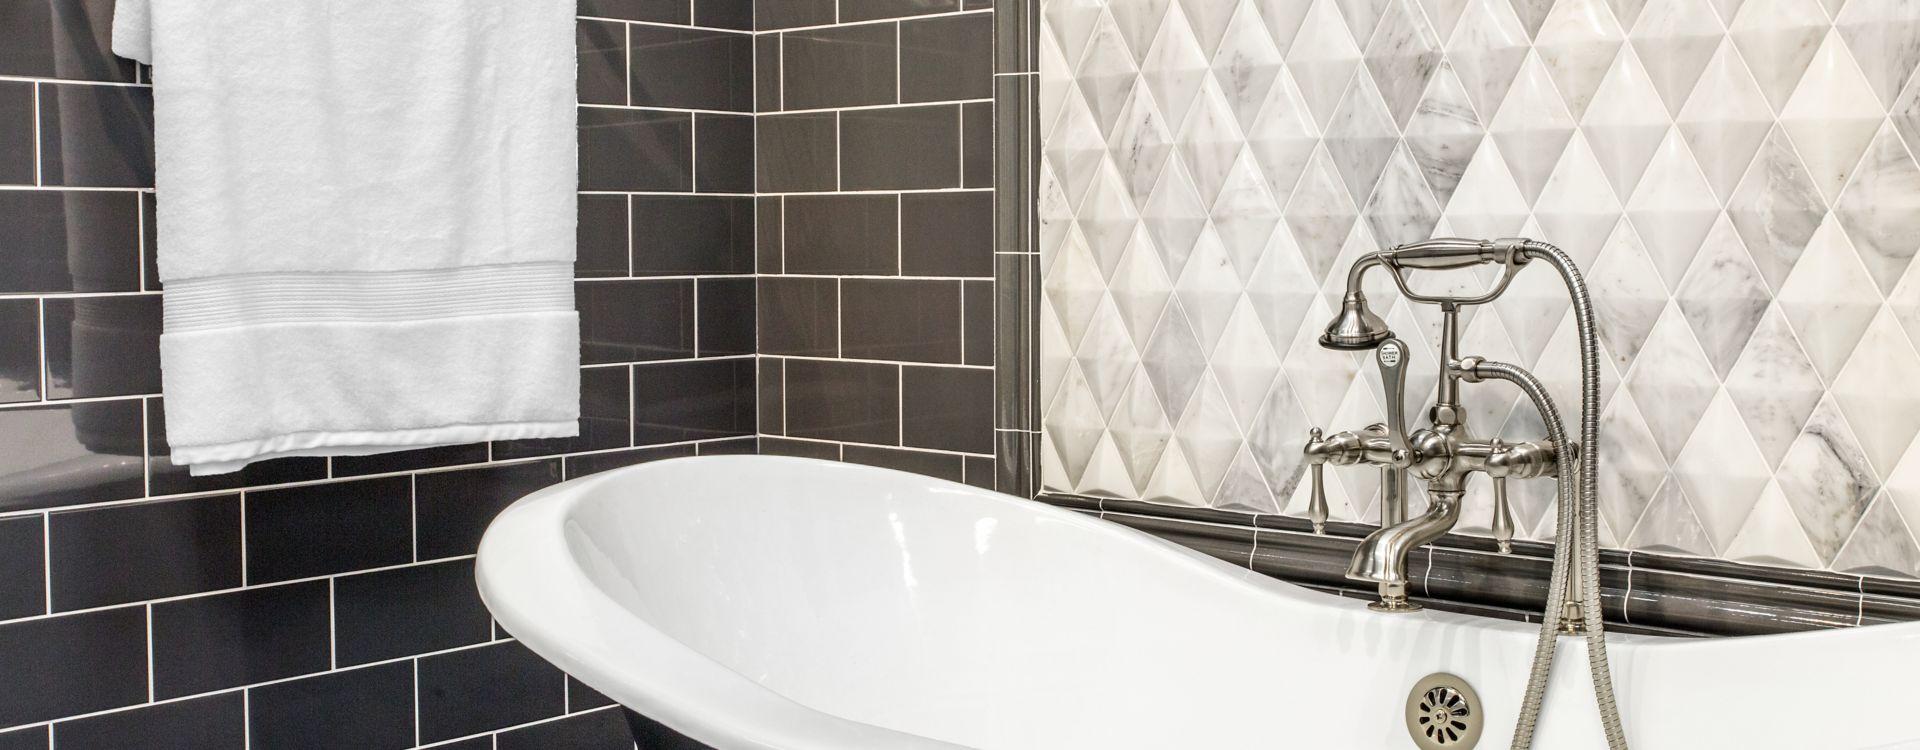 Bathroom Tile Ideas The Tile Shop